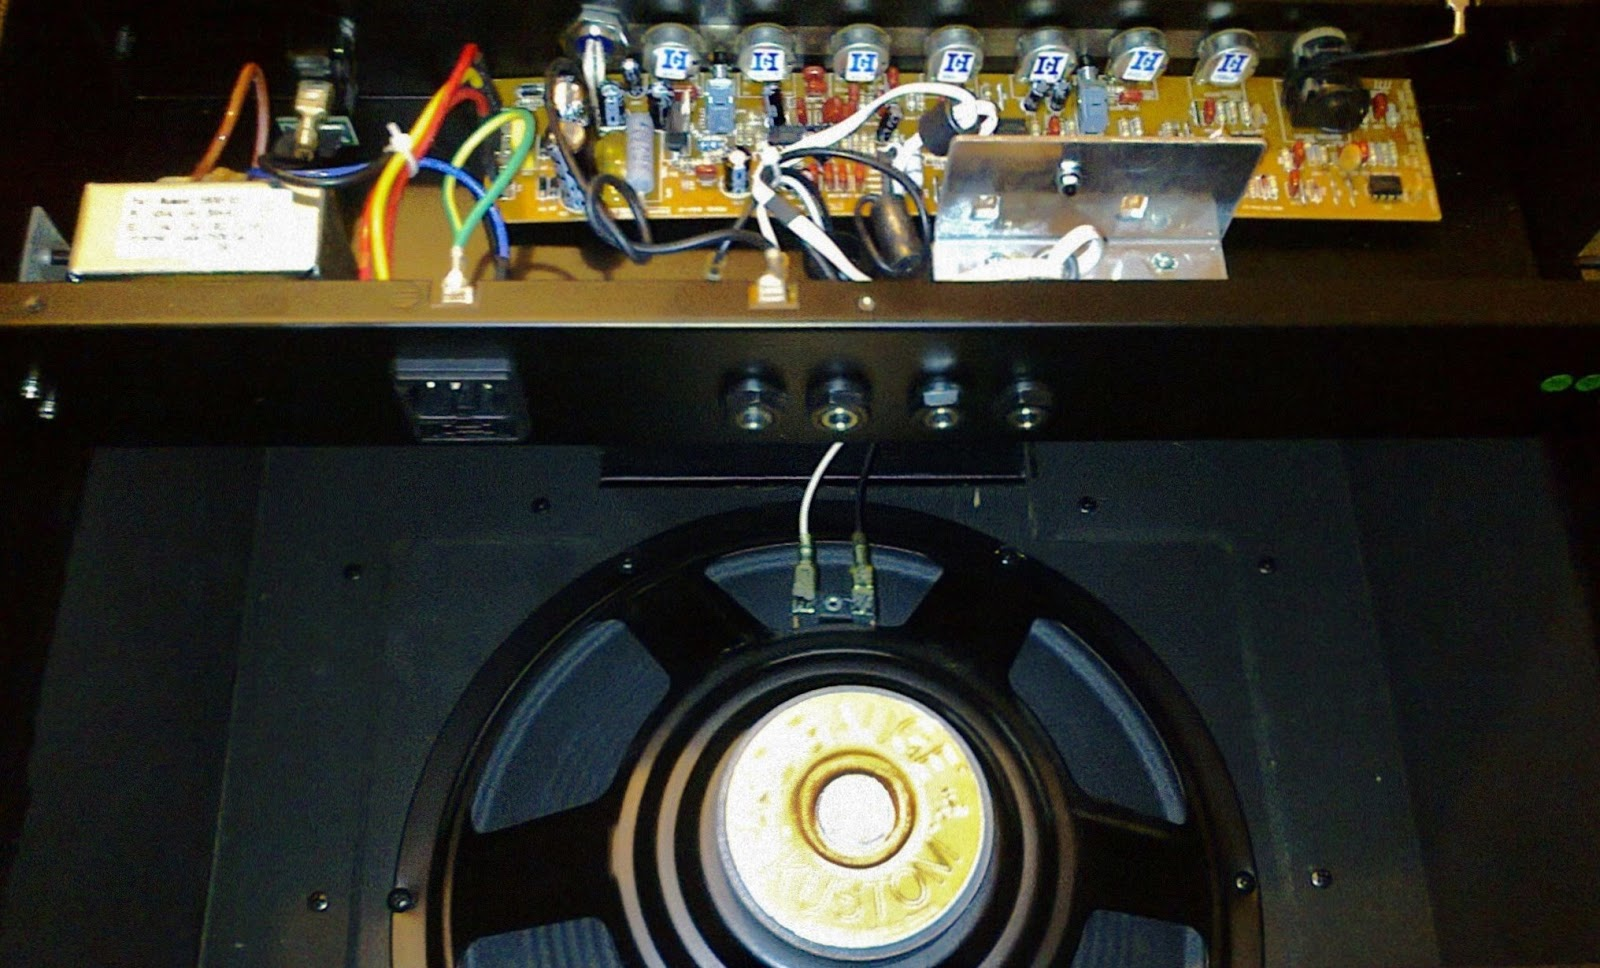 medium resolution of kustom 12 gauge amplifier mod guitar dreamer cheers